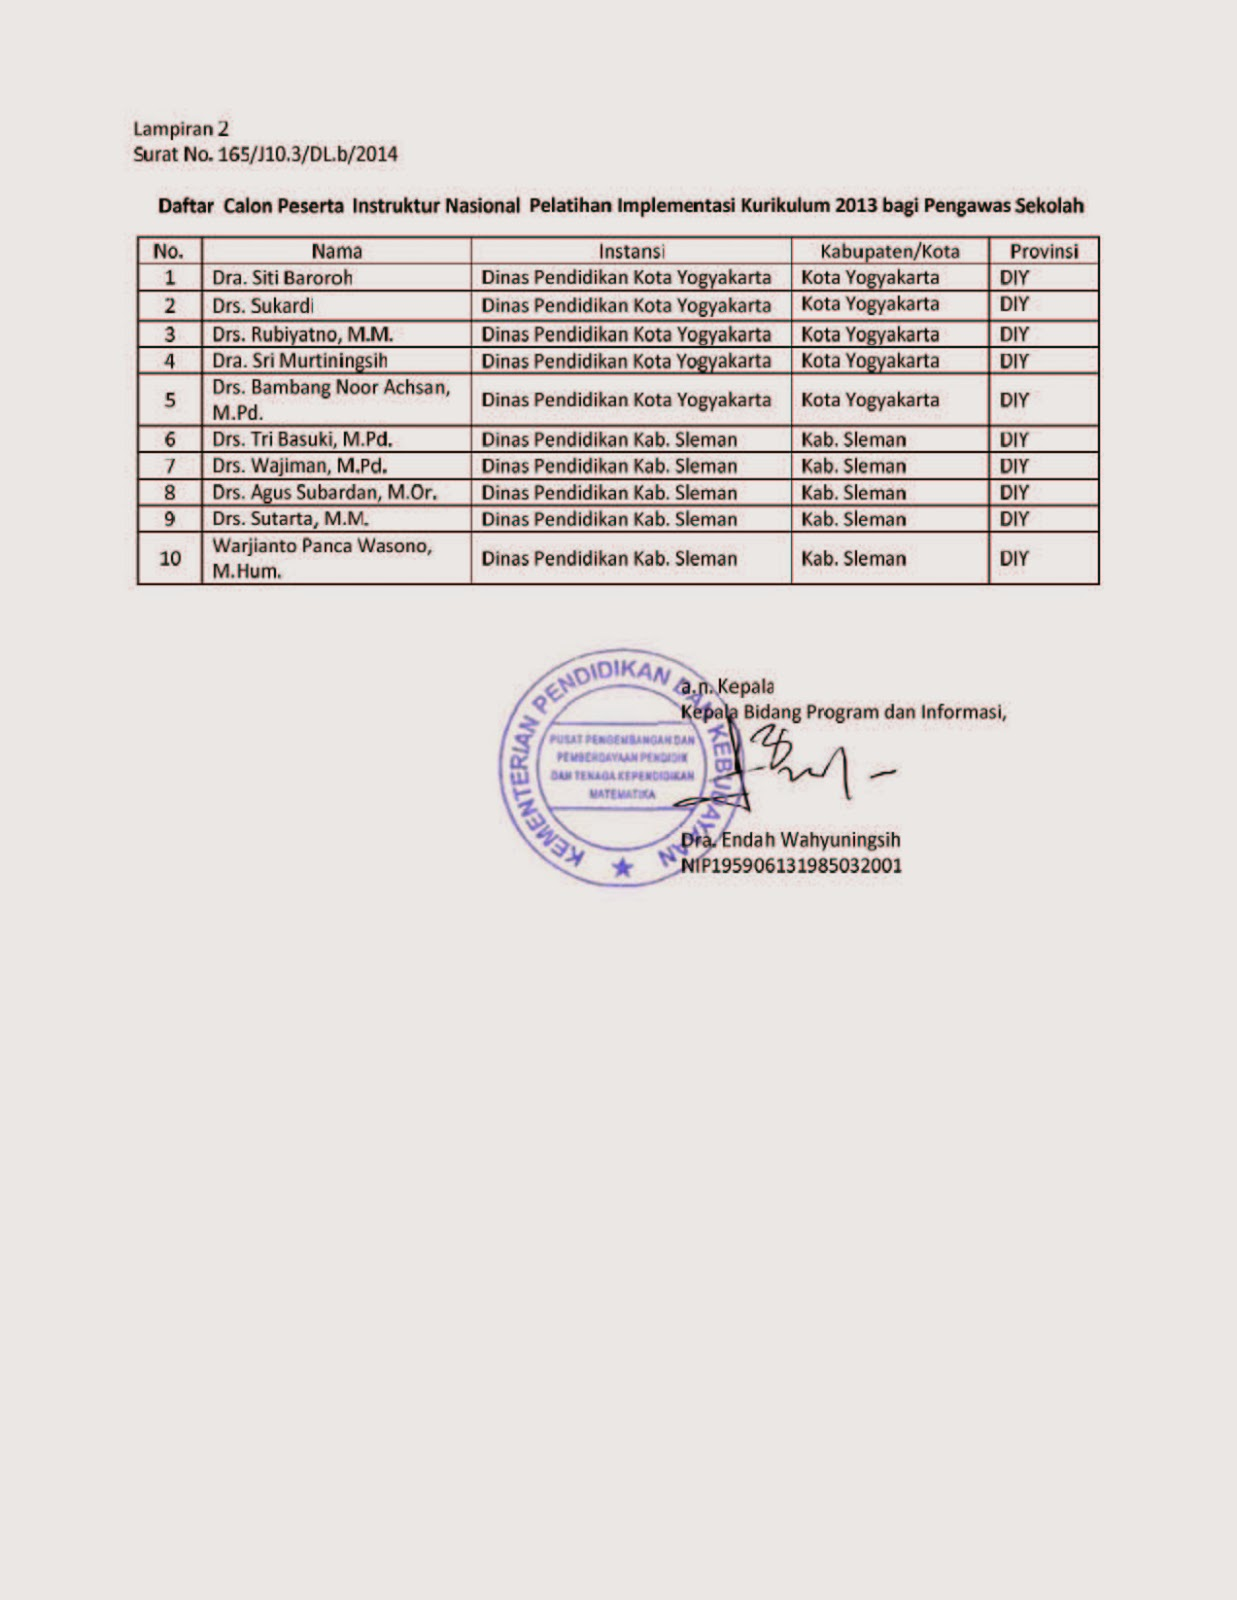 Contoh Daftar Riwayat Hidup Calon Kepala Desa Contoh Lem